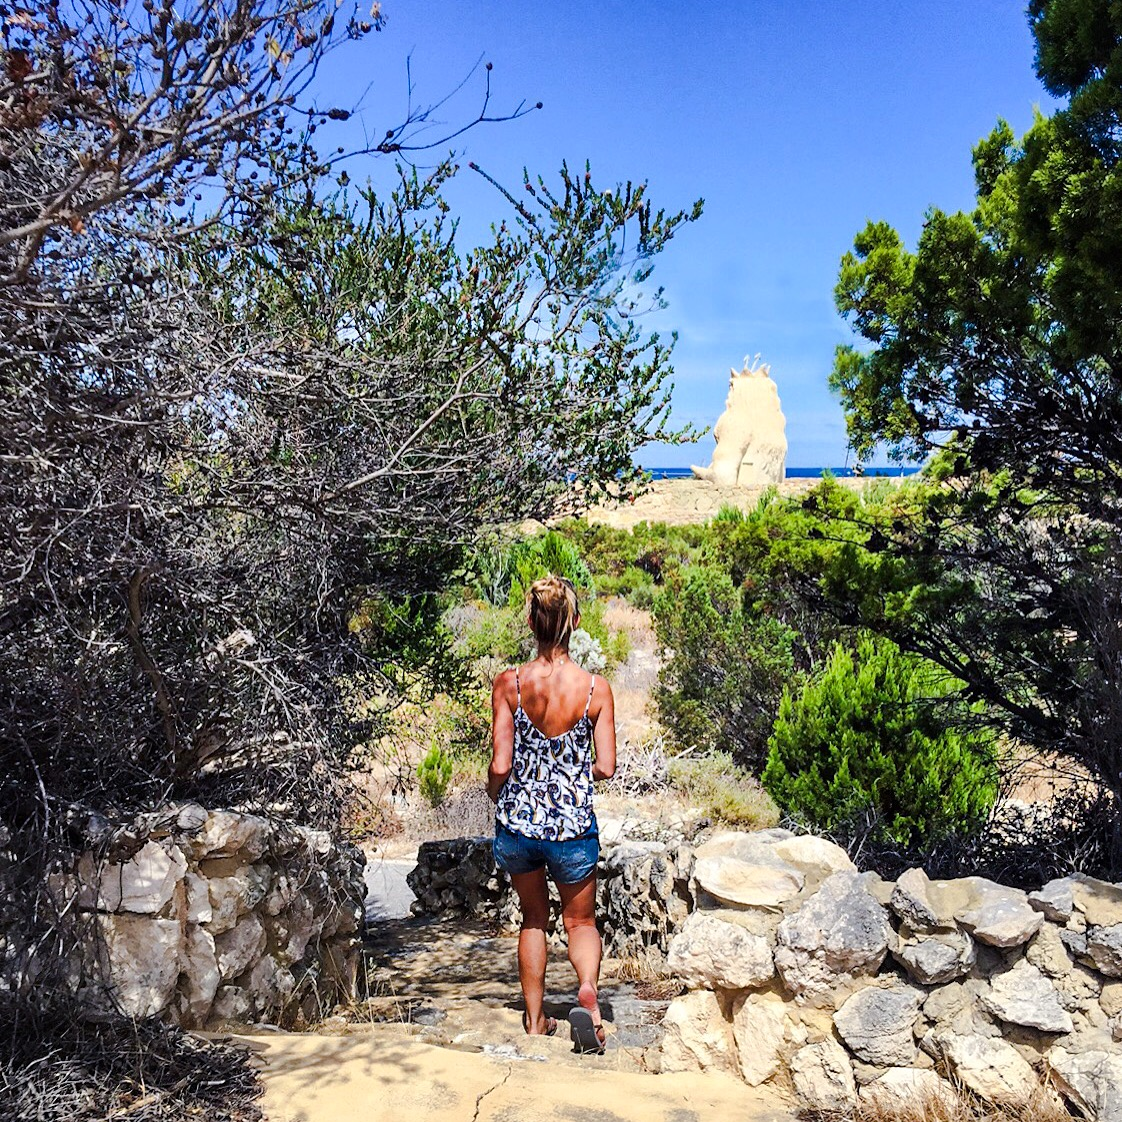 The Return To Atlantis Marine Park - Katie Rebekah - An Australian lifestyle blog